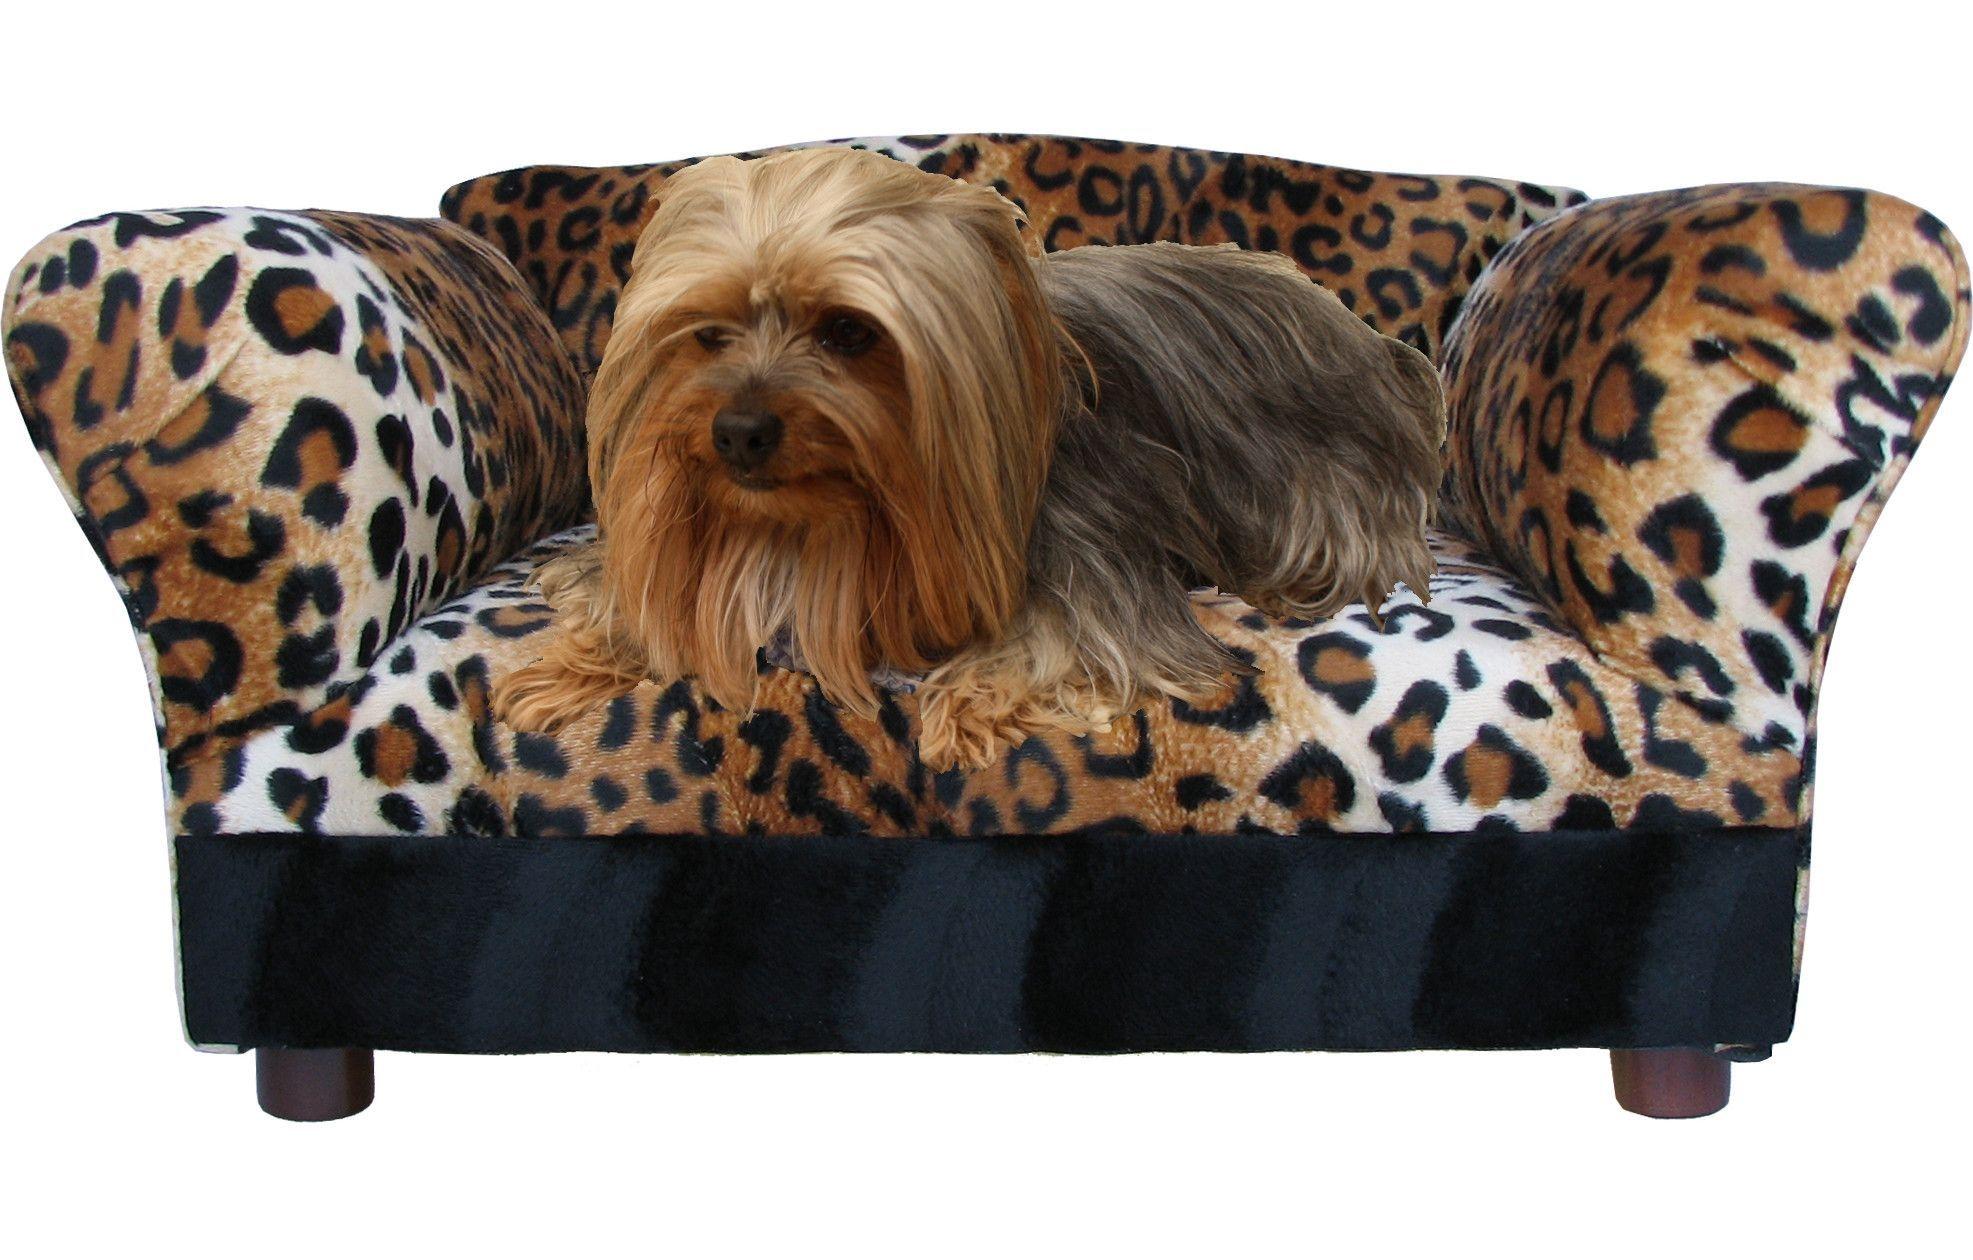 Cheetah Print Dog Bed Ideas On Foter